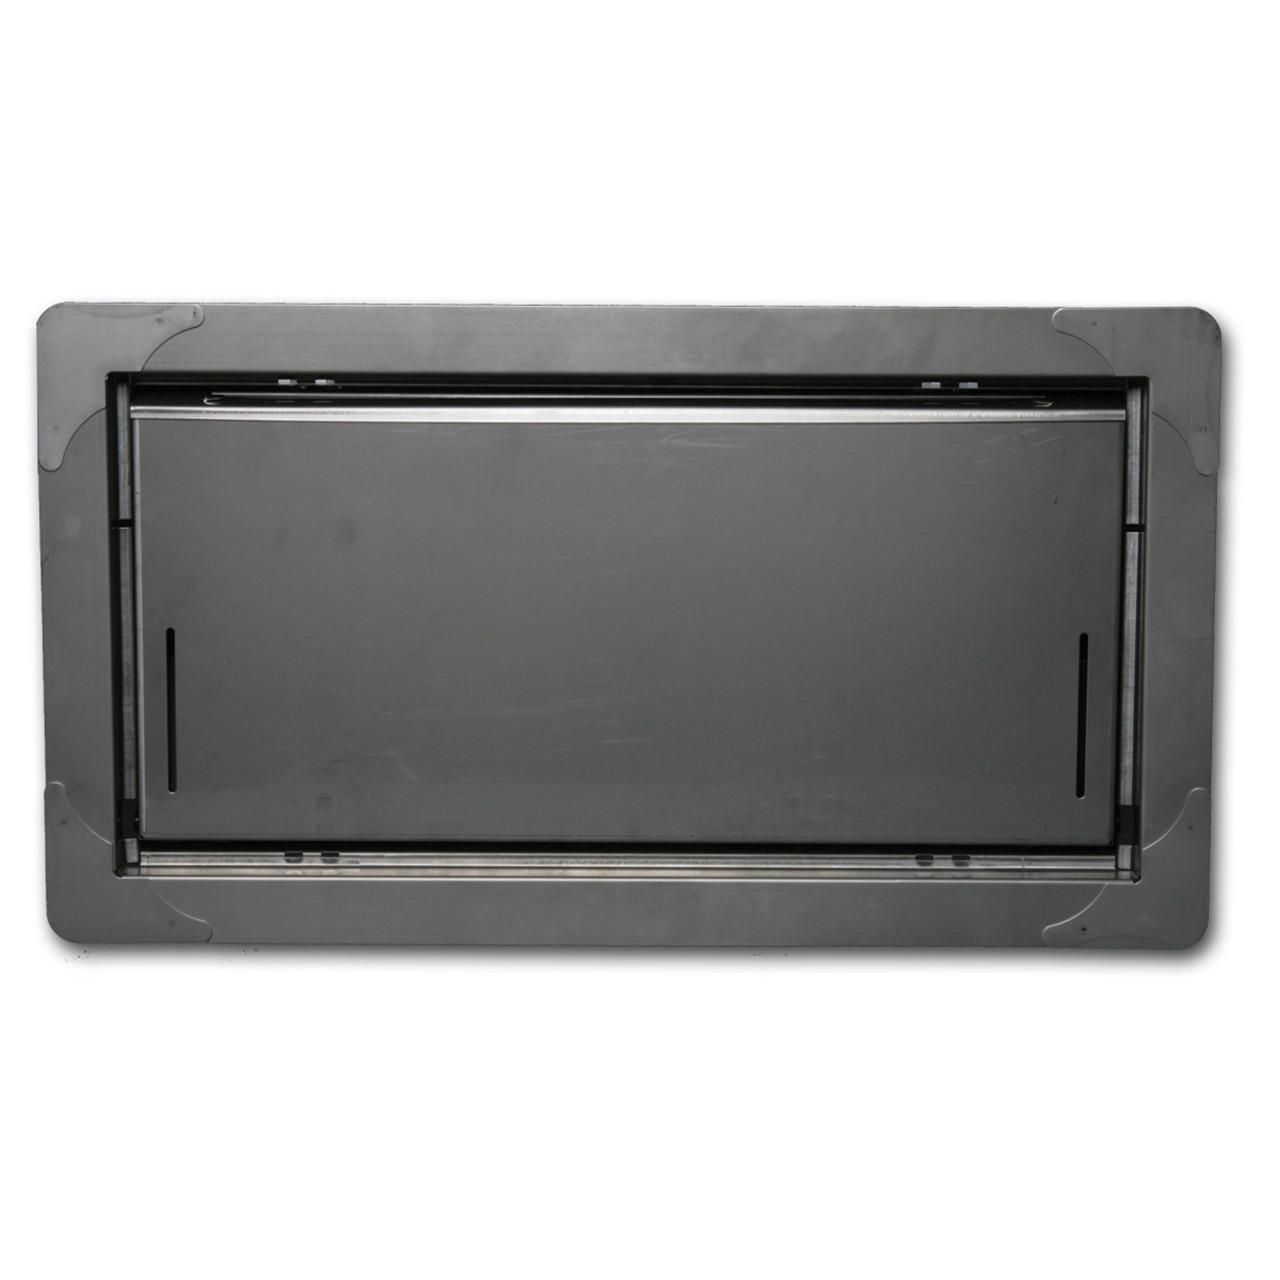 Smart Vent model 1540-520